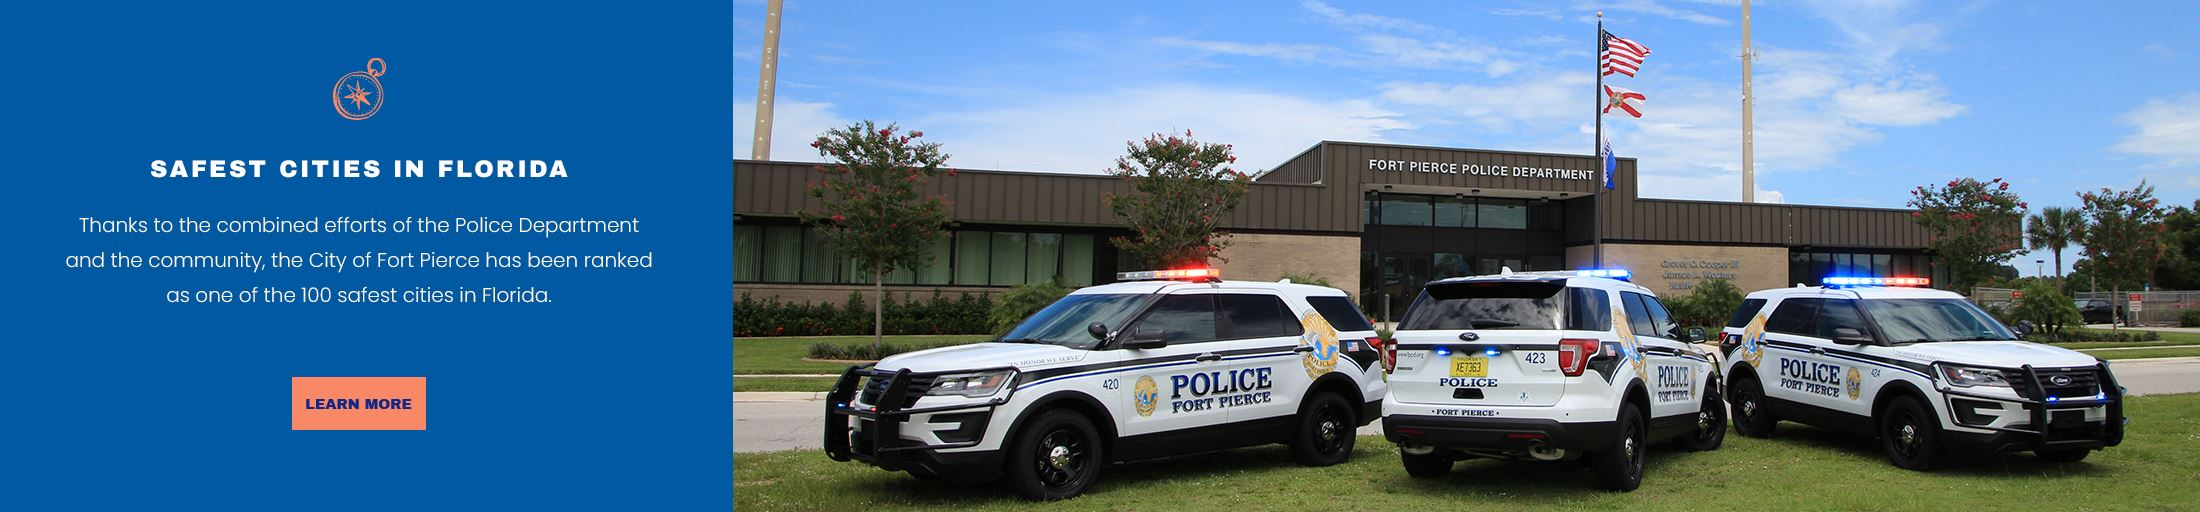 Police Department | Fort Pierce, FL - Official Website